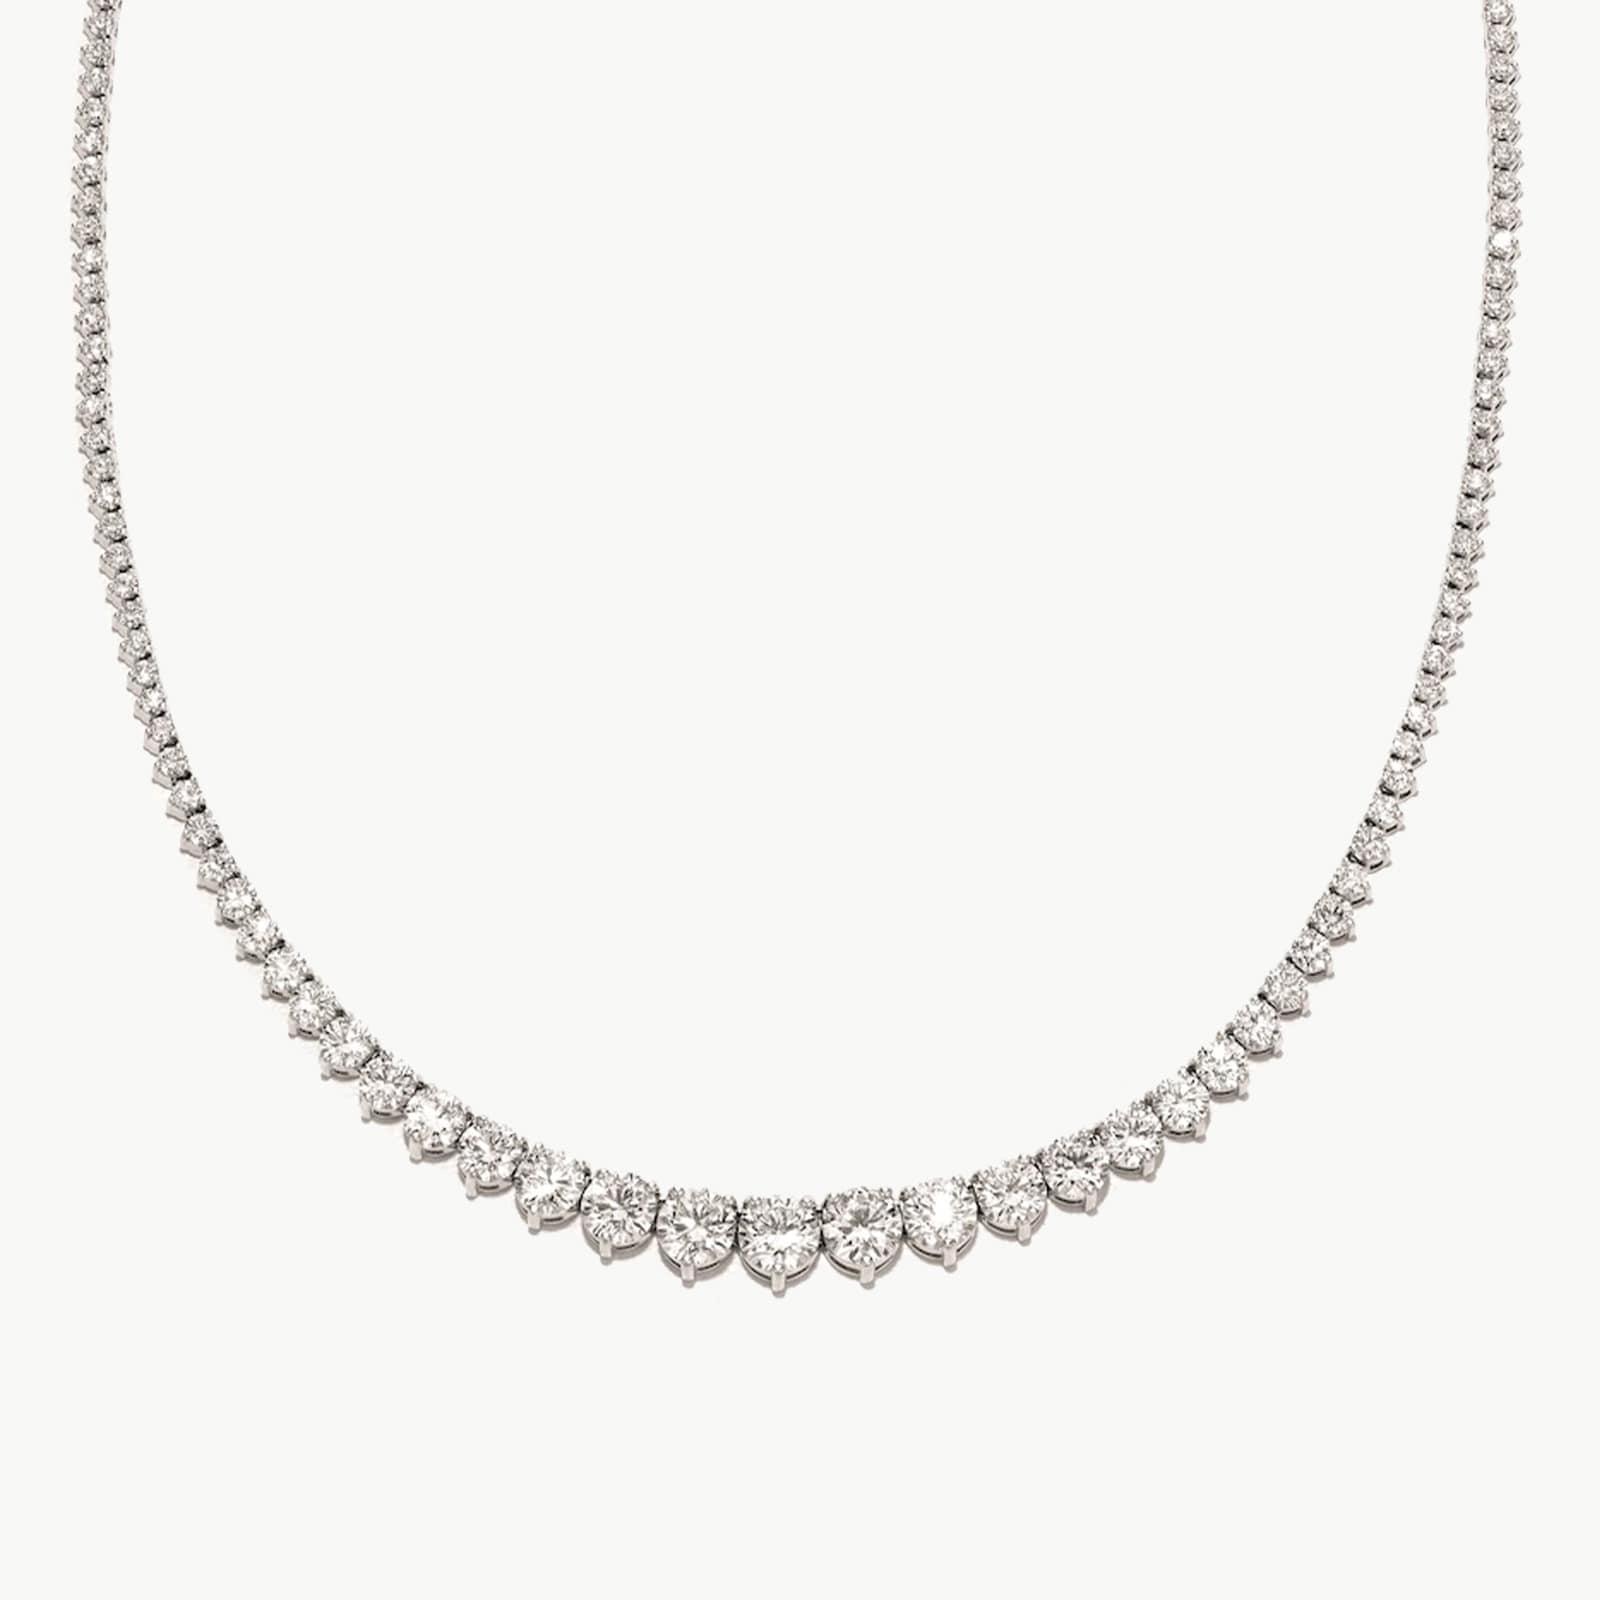 18k White Gold 12.20cttw Diamond Necklace